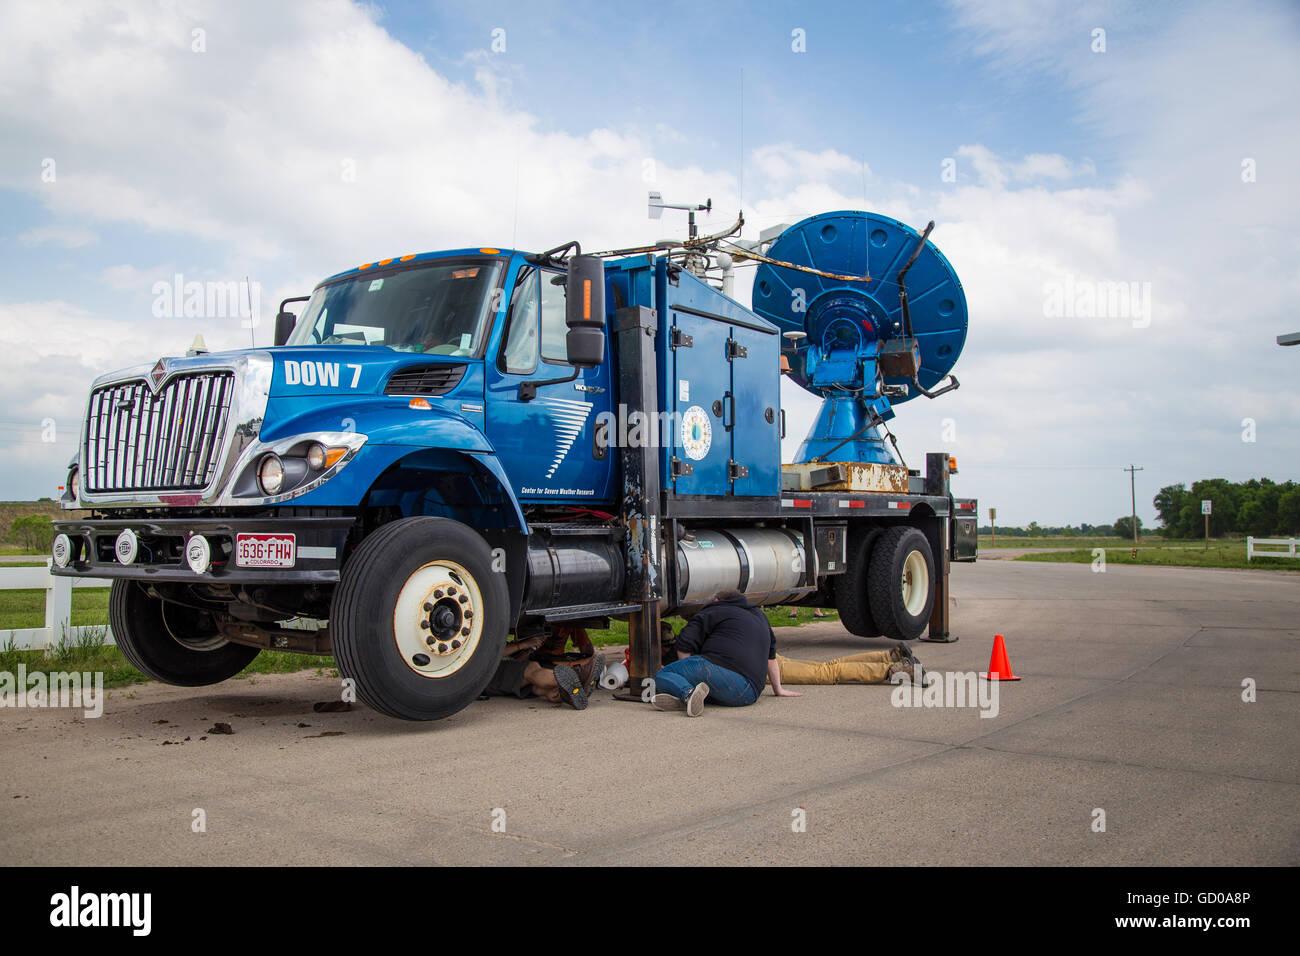 A Doppler on Wheels truck designed to scan tornadoes with Doppler Radar undergoes maintenance in Ansley, Nebraska, - Stock Image